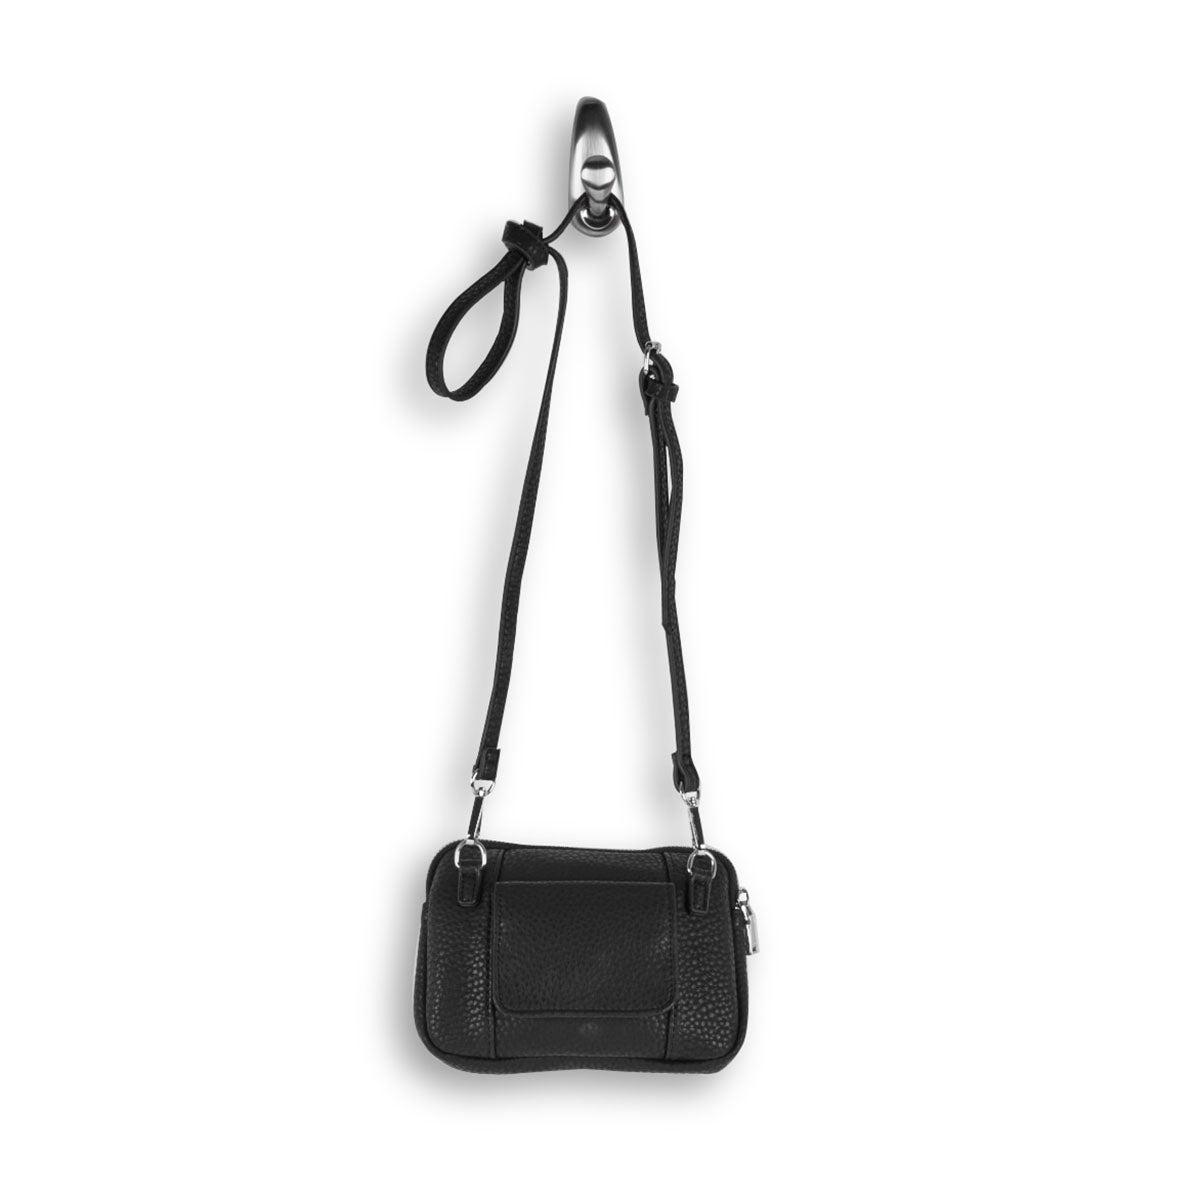 Lds Sydney Crossbody blk zip up wallet